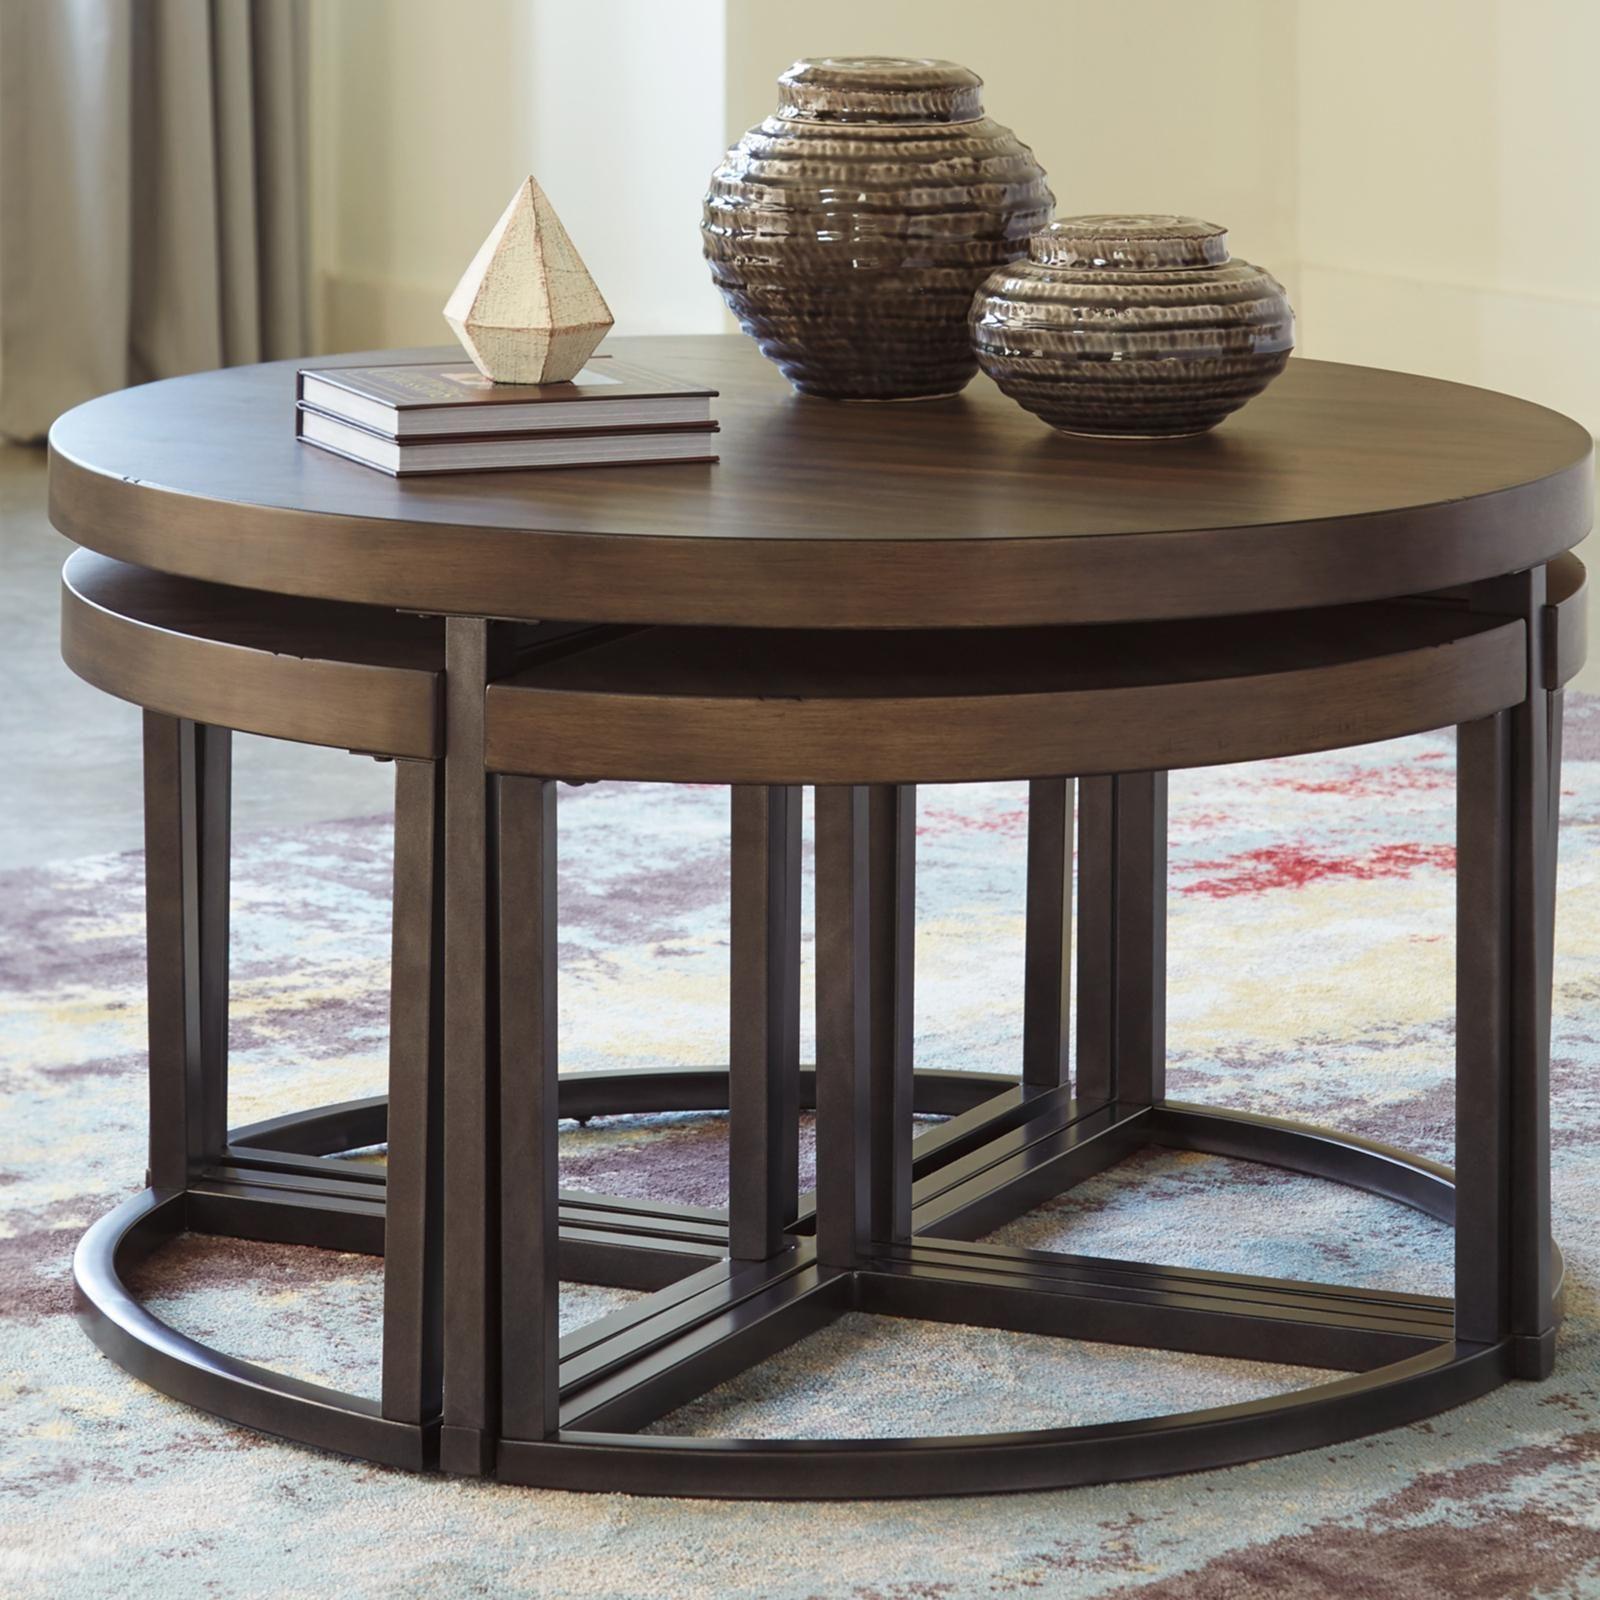 Ashley Furniture Johurst 5 Piece Table Set Coffee Table Coffee Table Square Coffee Table With Stools [ 1600 x 1600 Pixel ]